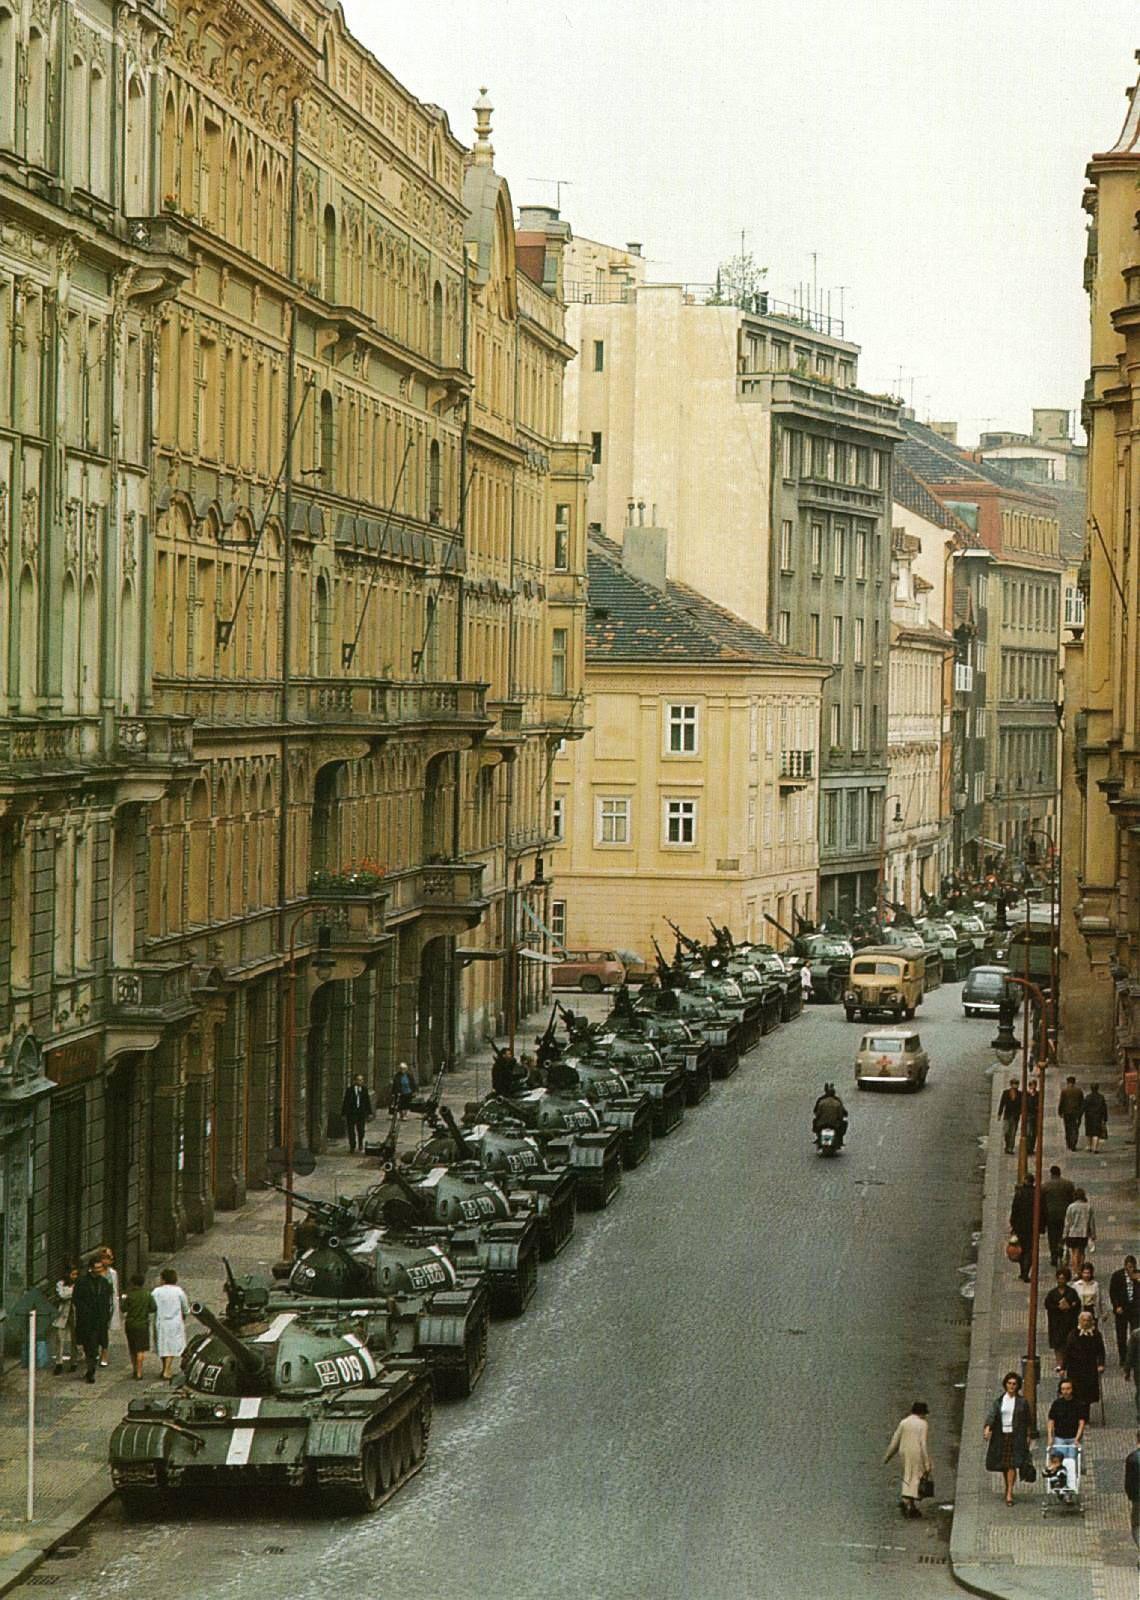 Soviet tanks parked in the streets of Prague Czechoslovakia - Praha (Prague), 1968